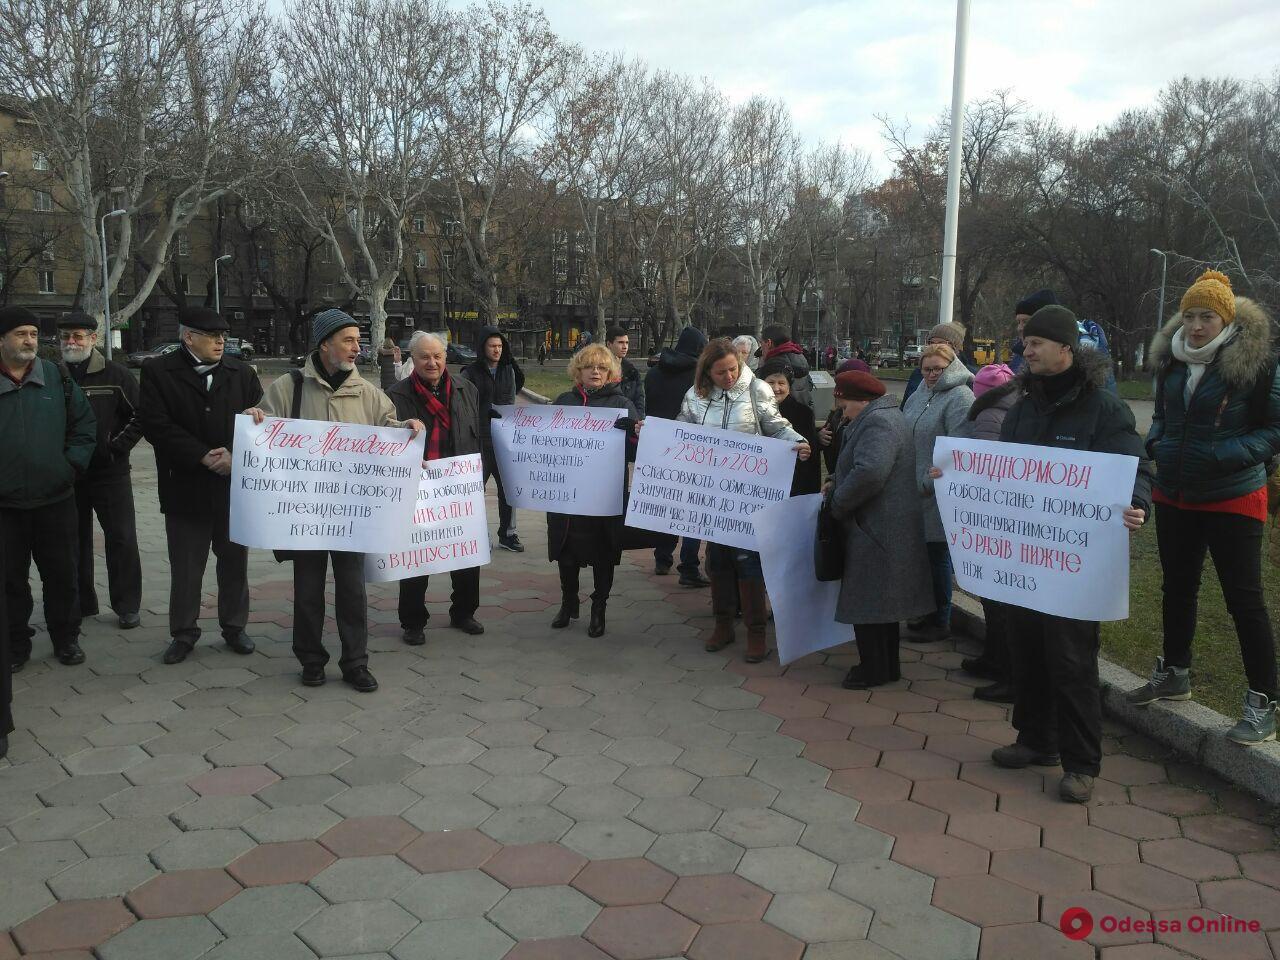 Сотрудники трех одесских вузов митинговали против нового законопроекта «О труде» (фото)